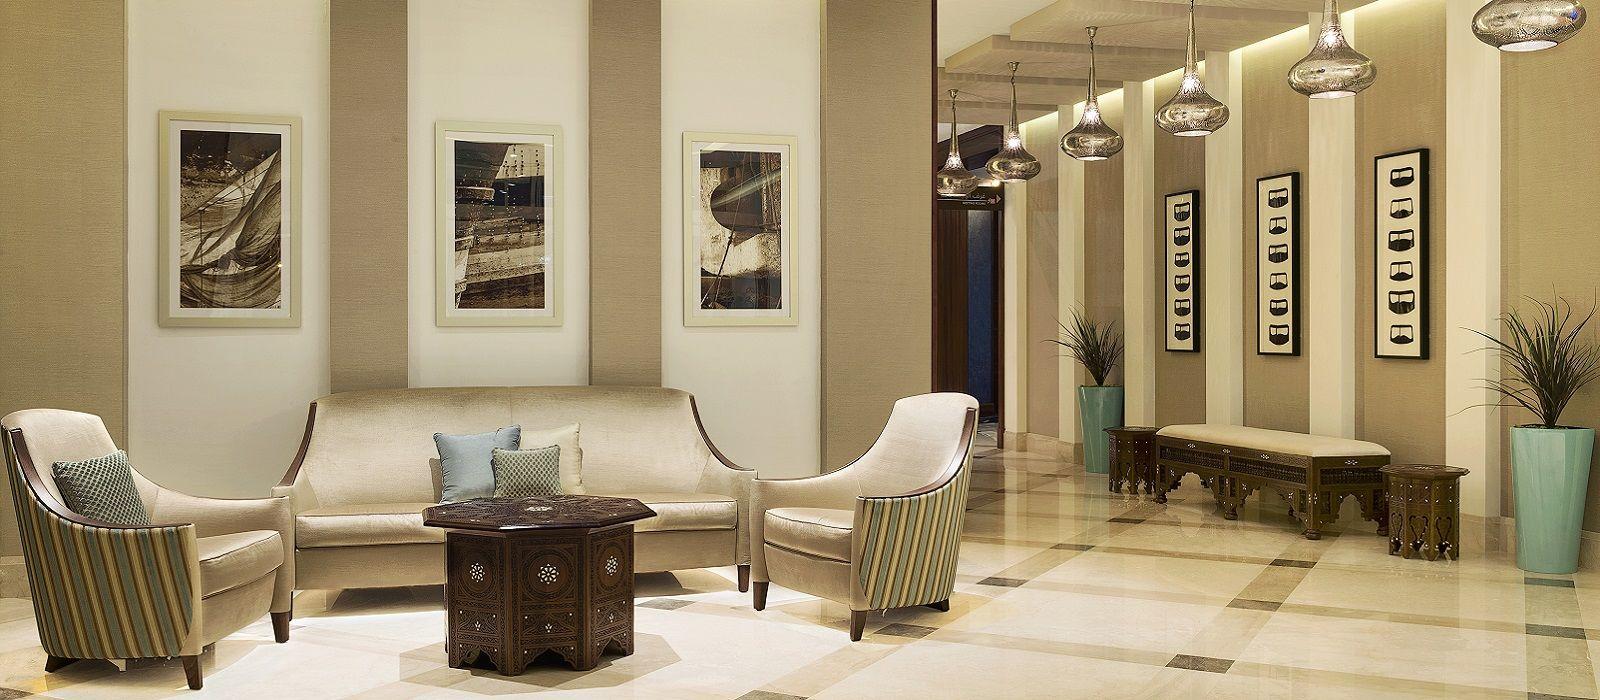 Hotel Hilton Garden Inn Dubai Al Mina United Arab Emirates